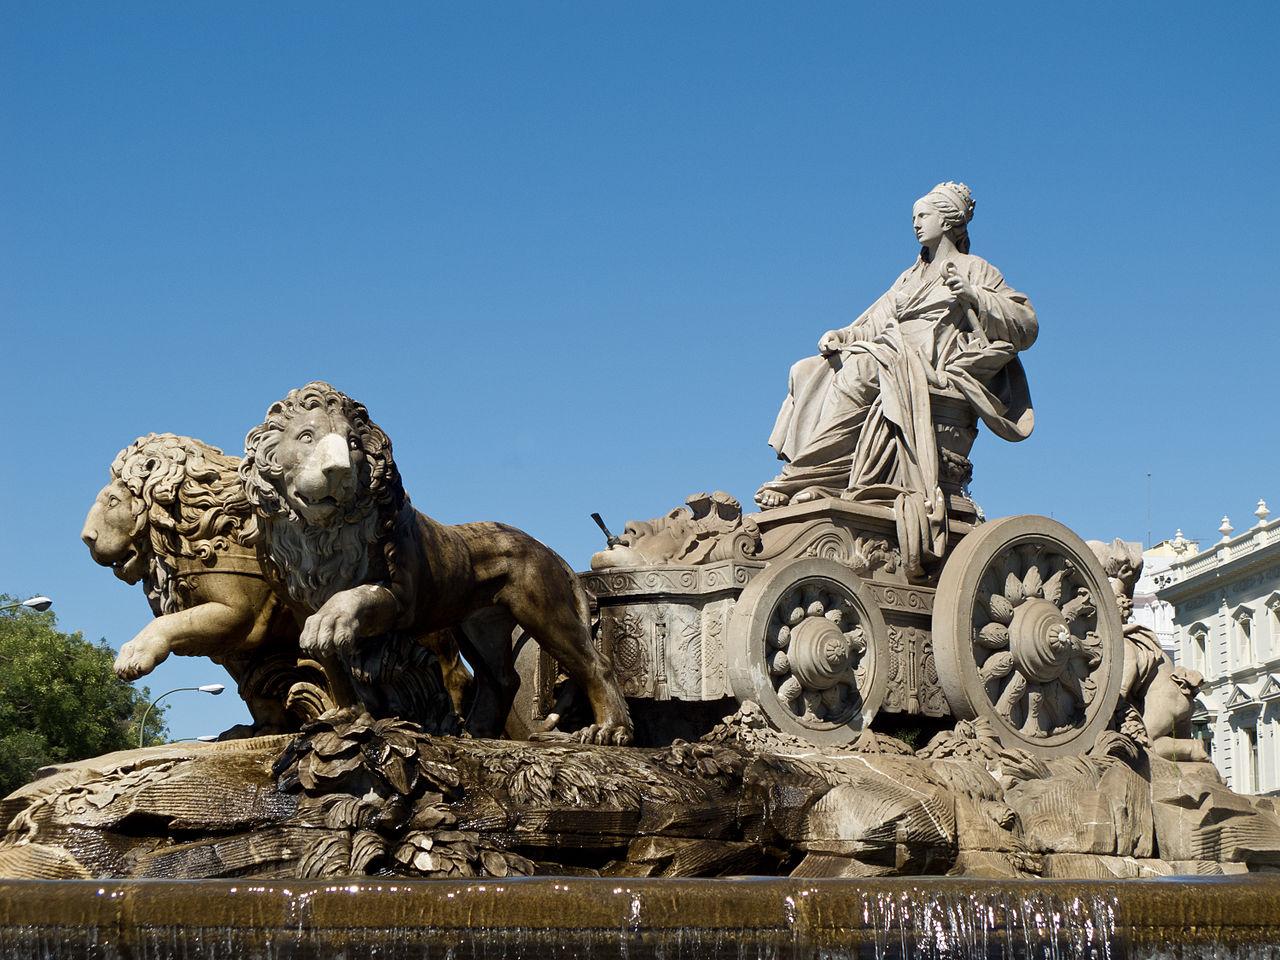 Фонтан Сибелес (богиня Кибела, олицетворение матери-природы) в Мадриде